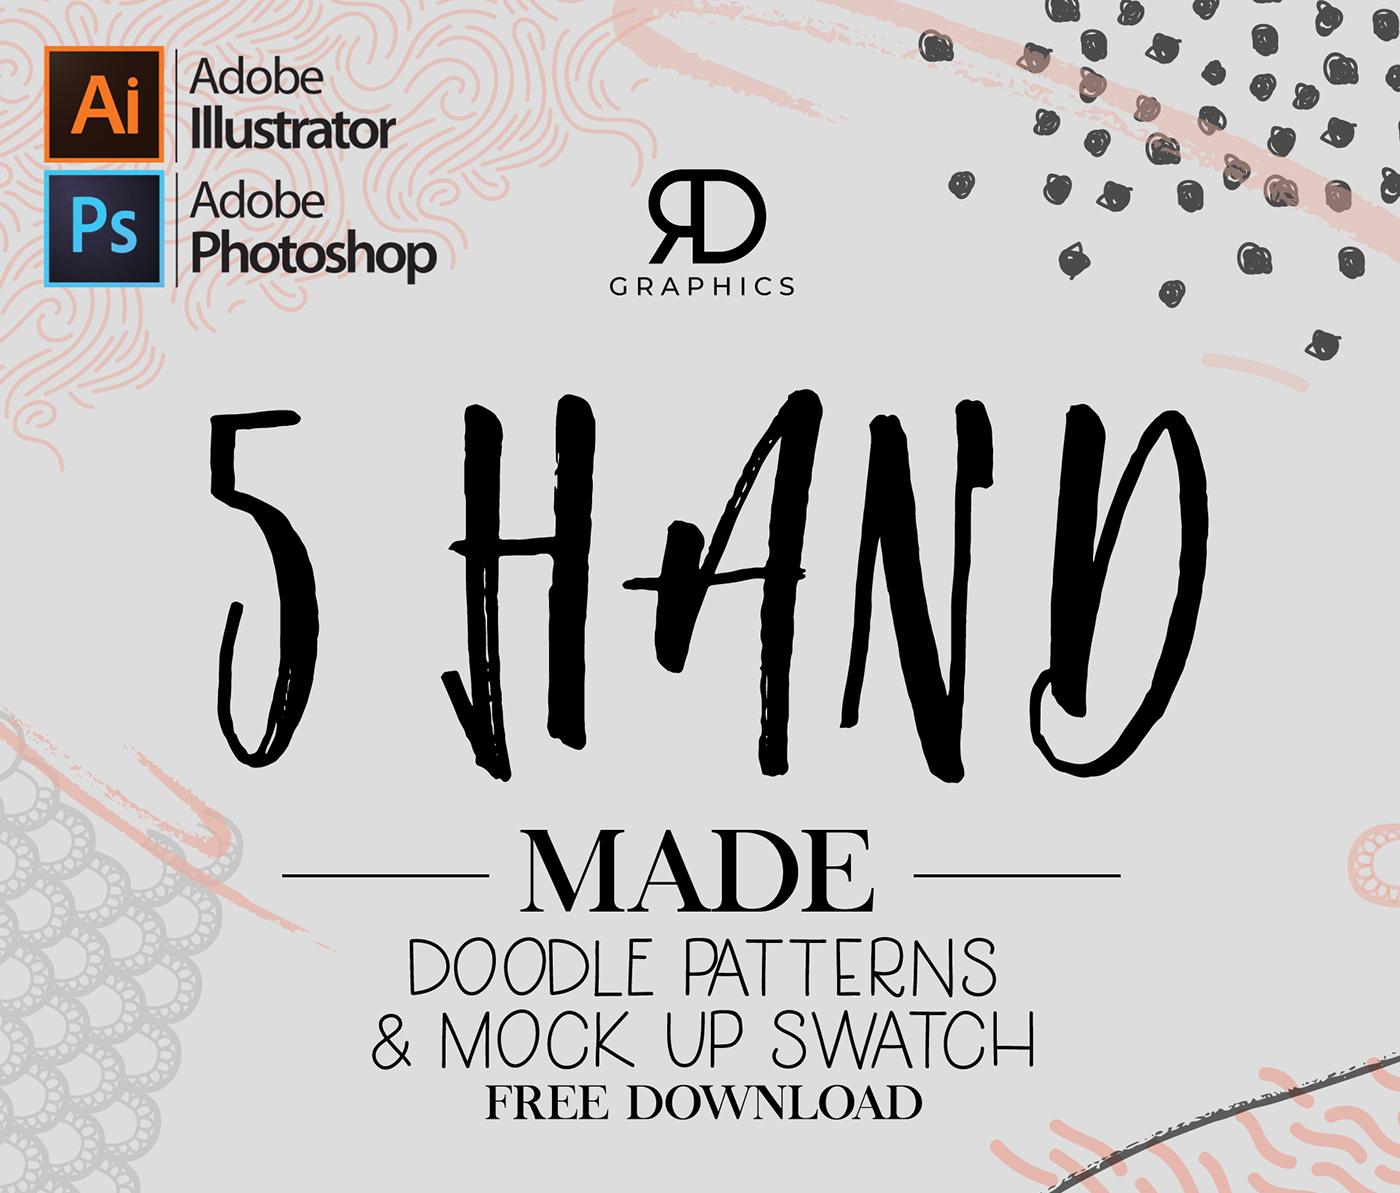 5 Handmade Doodle Patterns Free Download - FreePik Resources